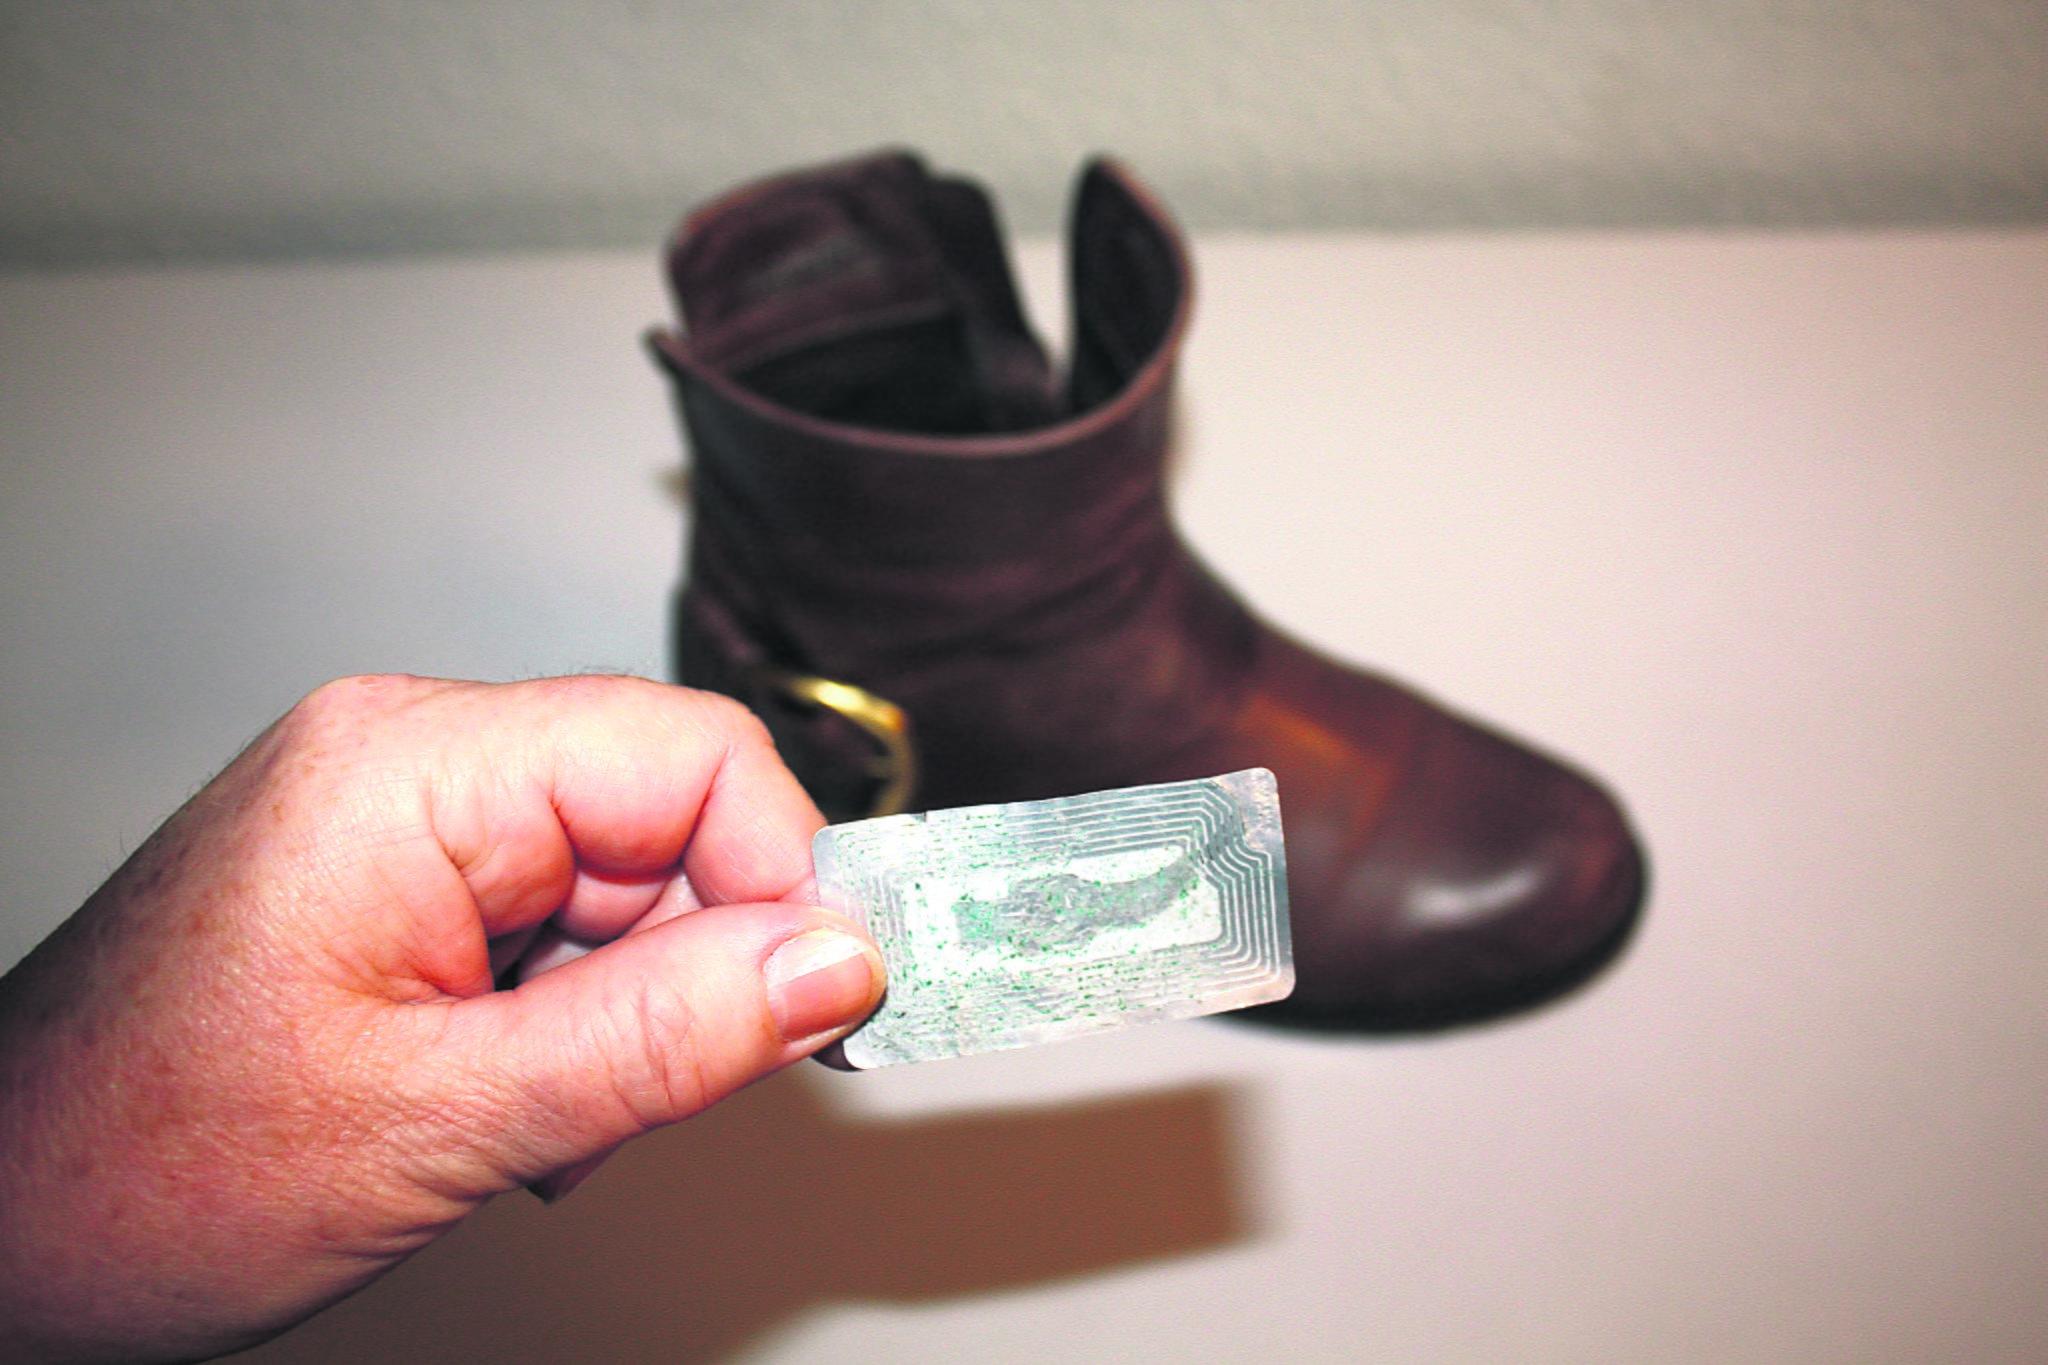 puma schuhe größenetikett entfernen